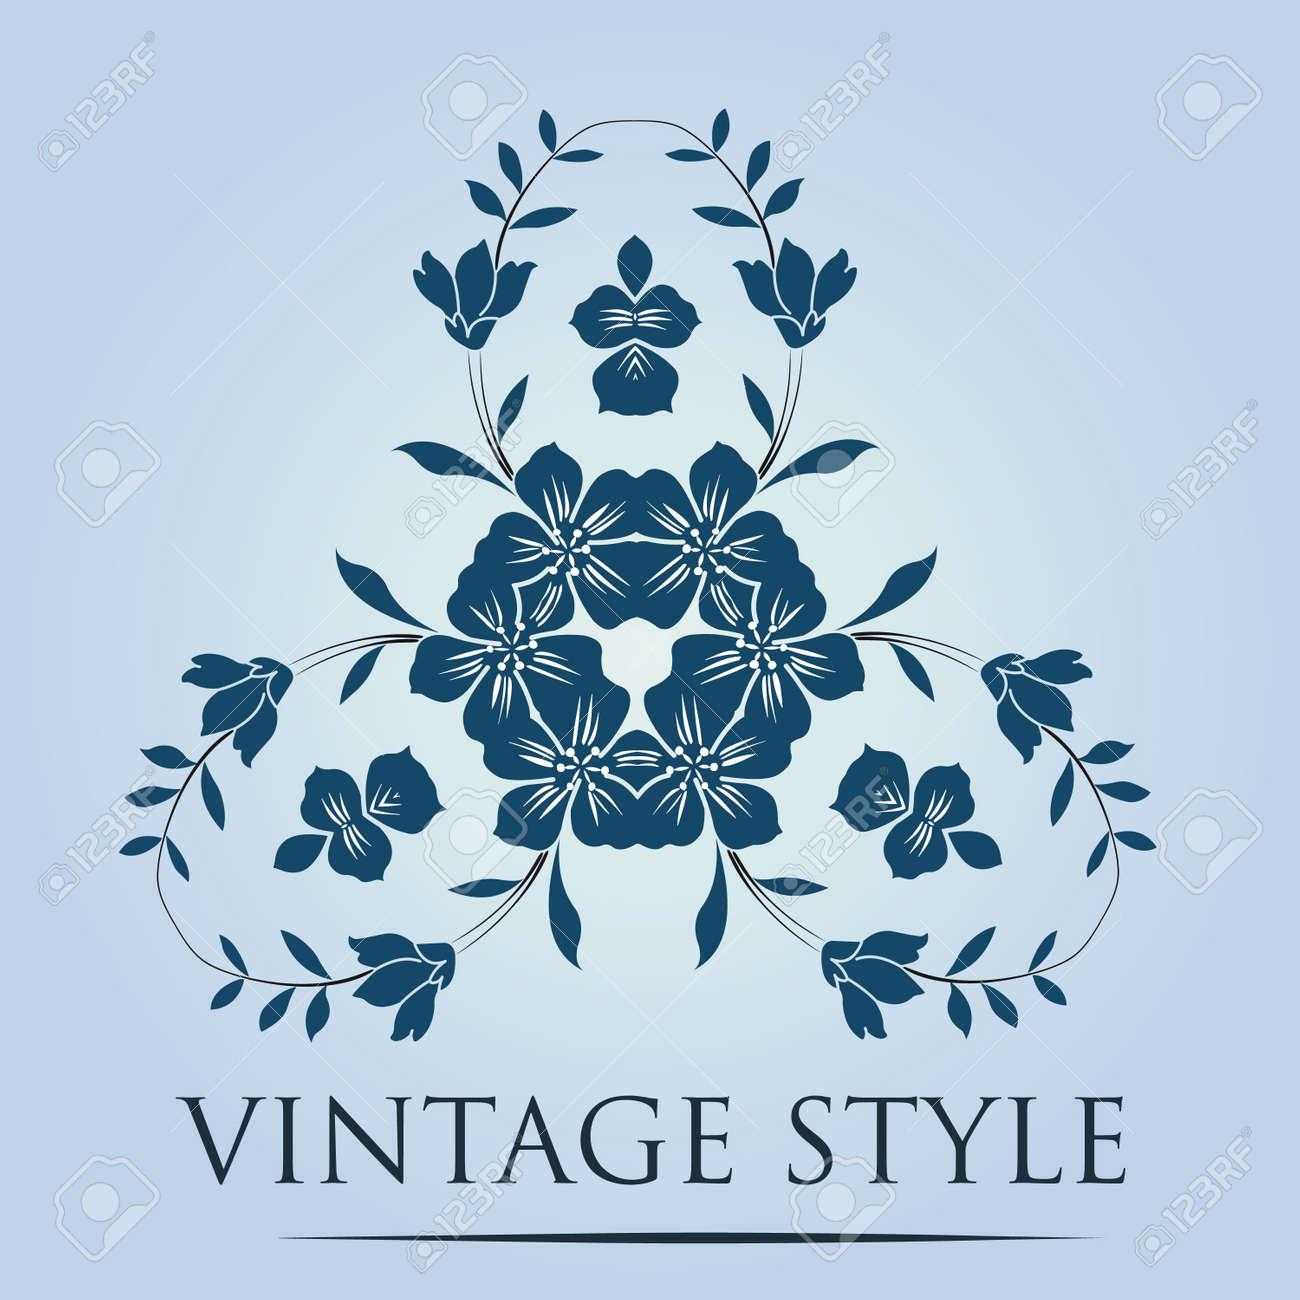 retro wallpaper Stock Vector - 14286332